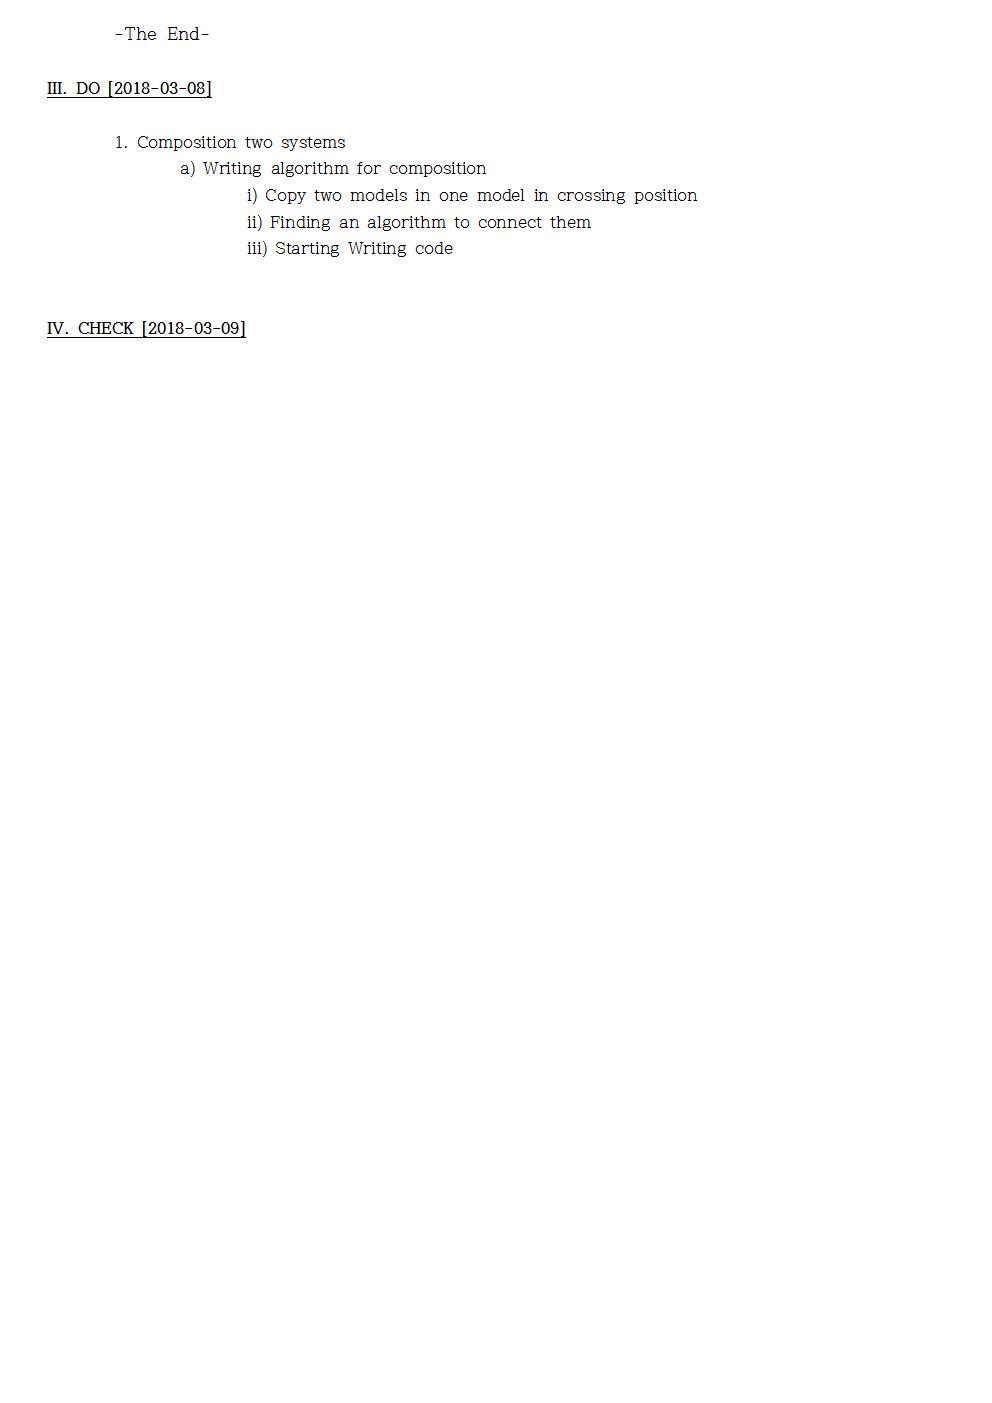 D-[18-002-RD-02]-[PRISM2.0-ADOxx]-[2018-03-08]-[MR]002.jpg